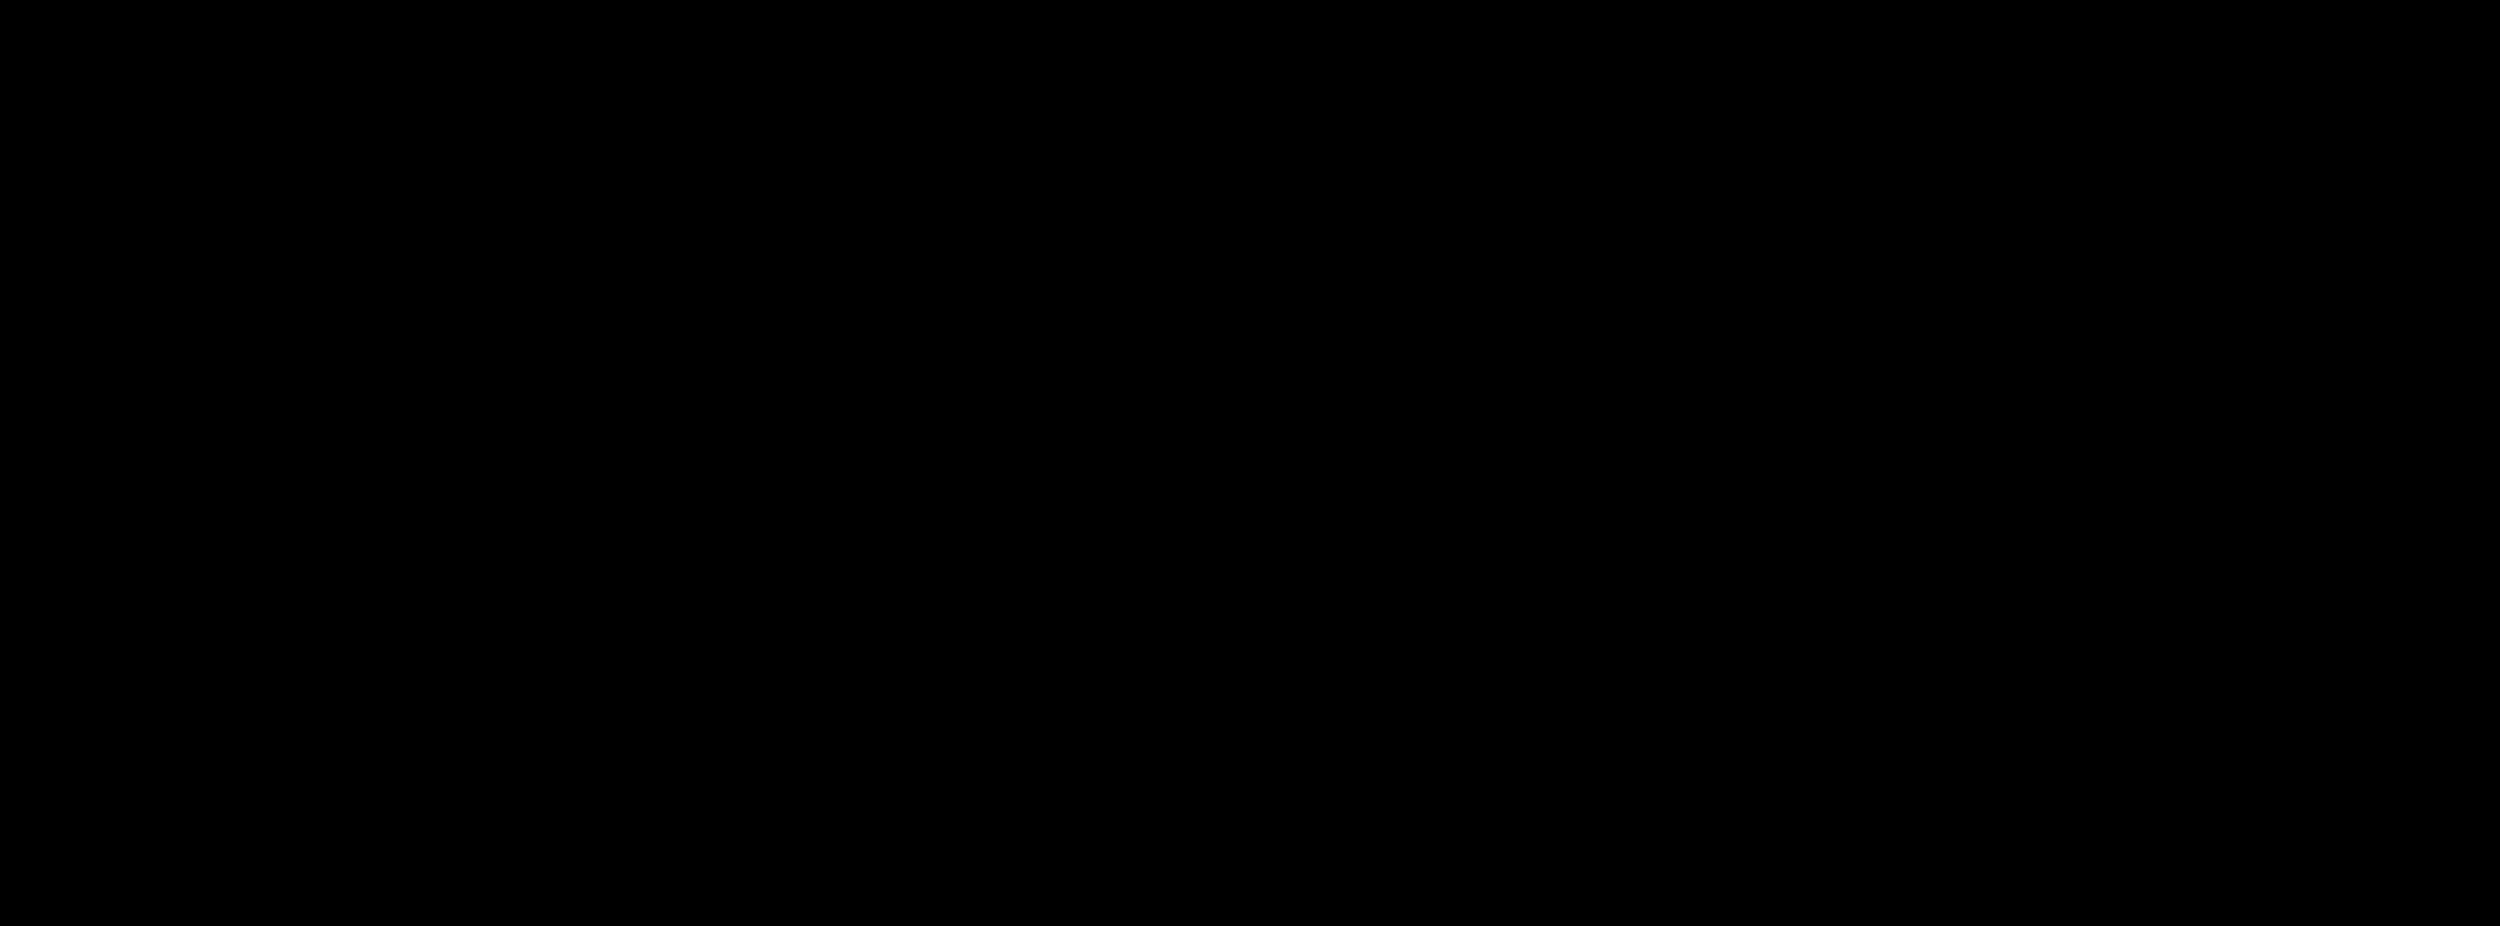 USyd_USCMA_logo_lockup.png